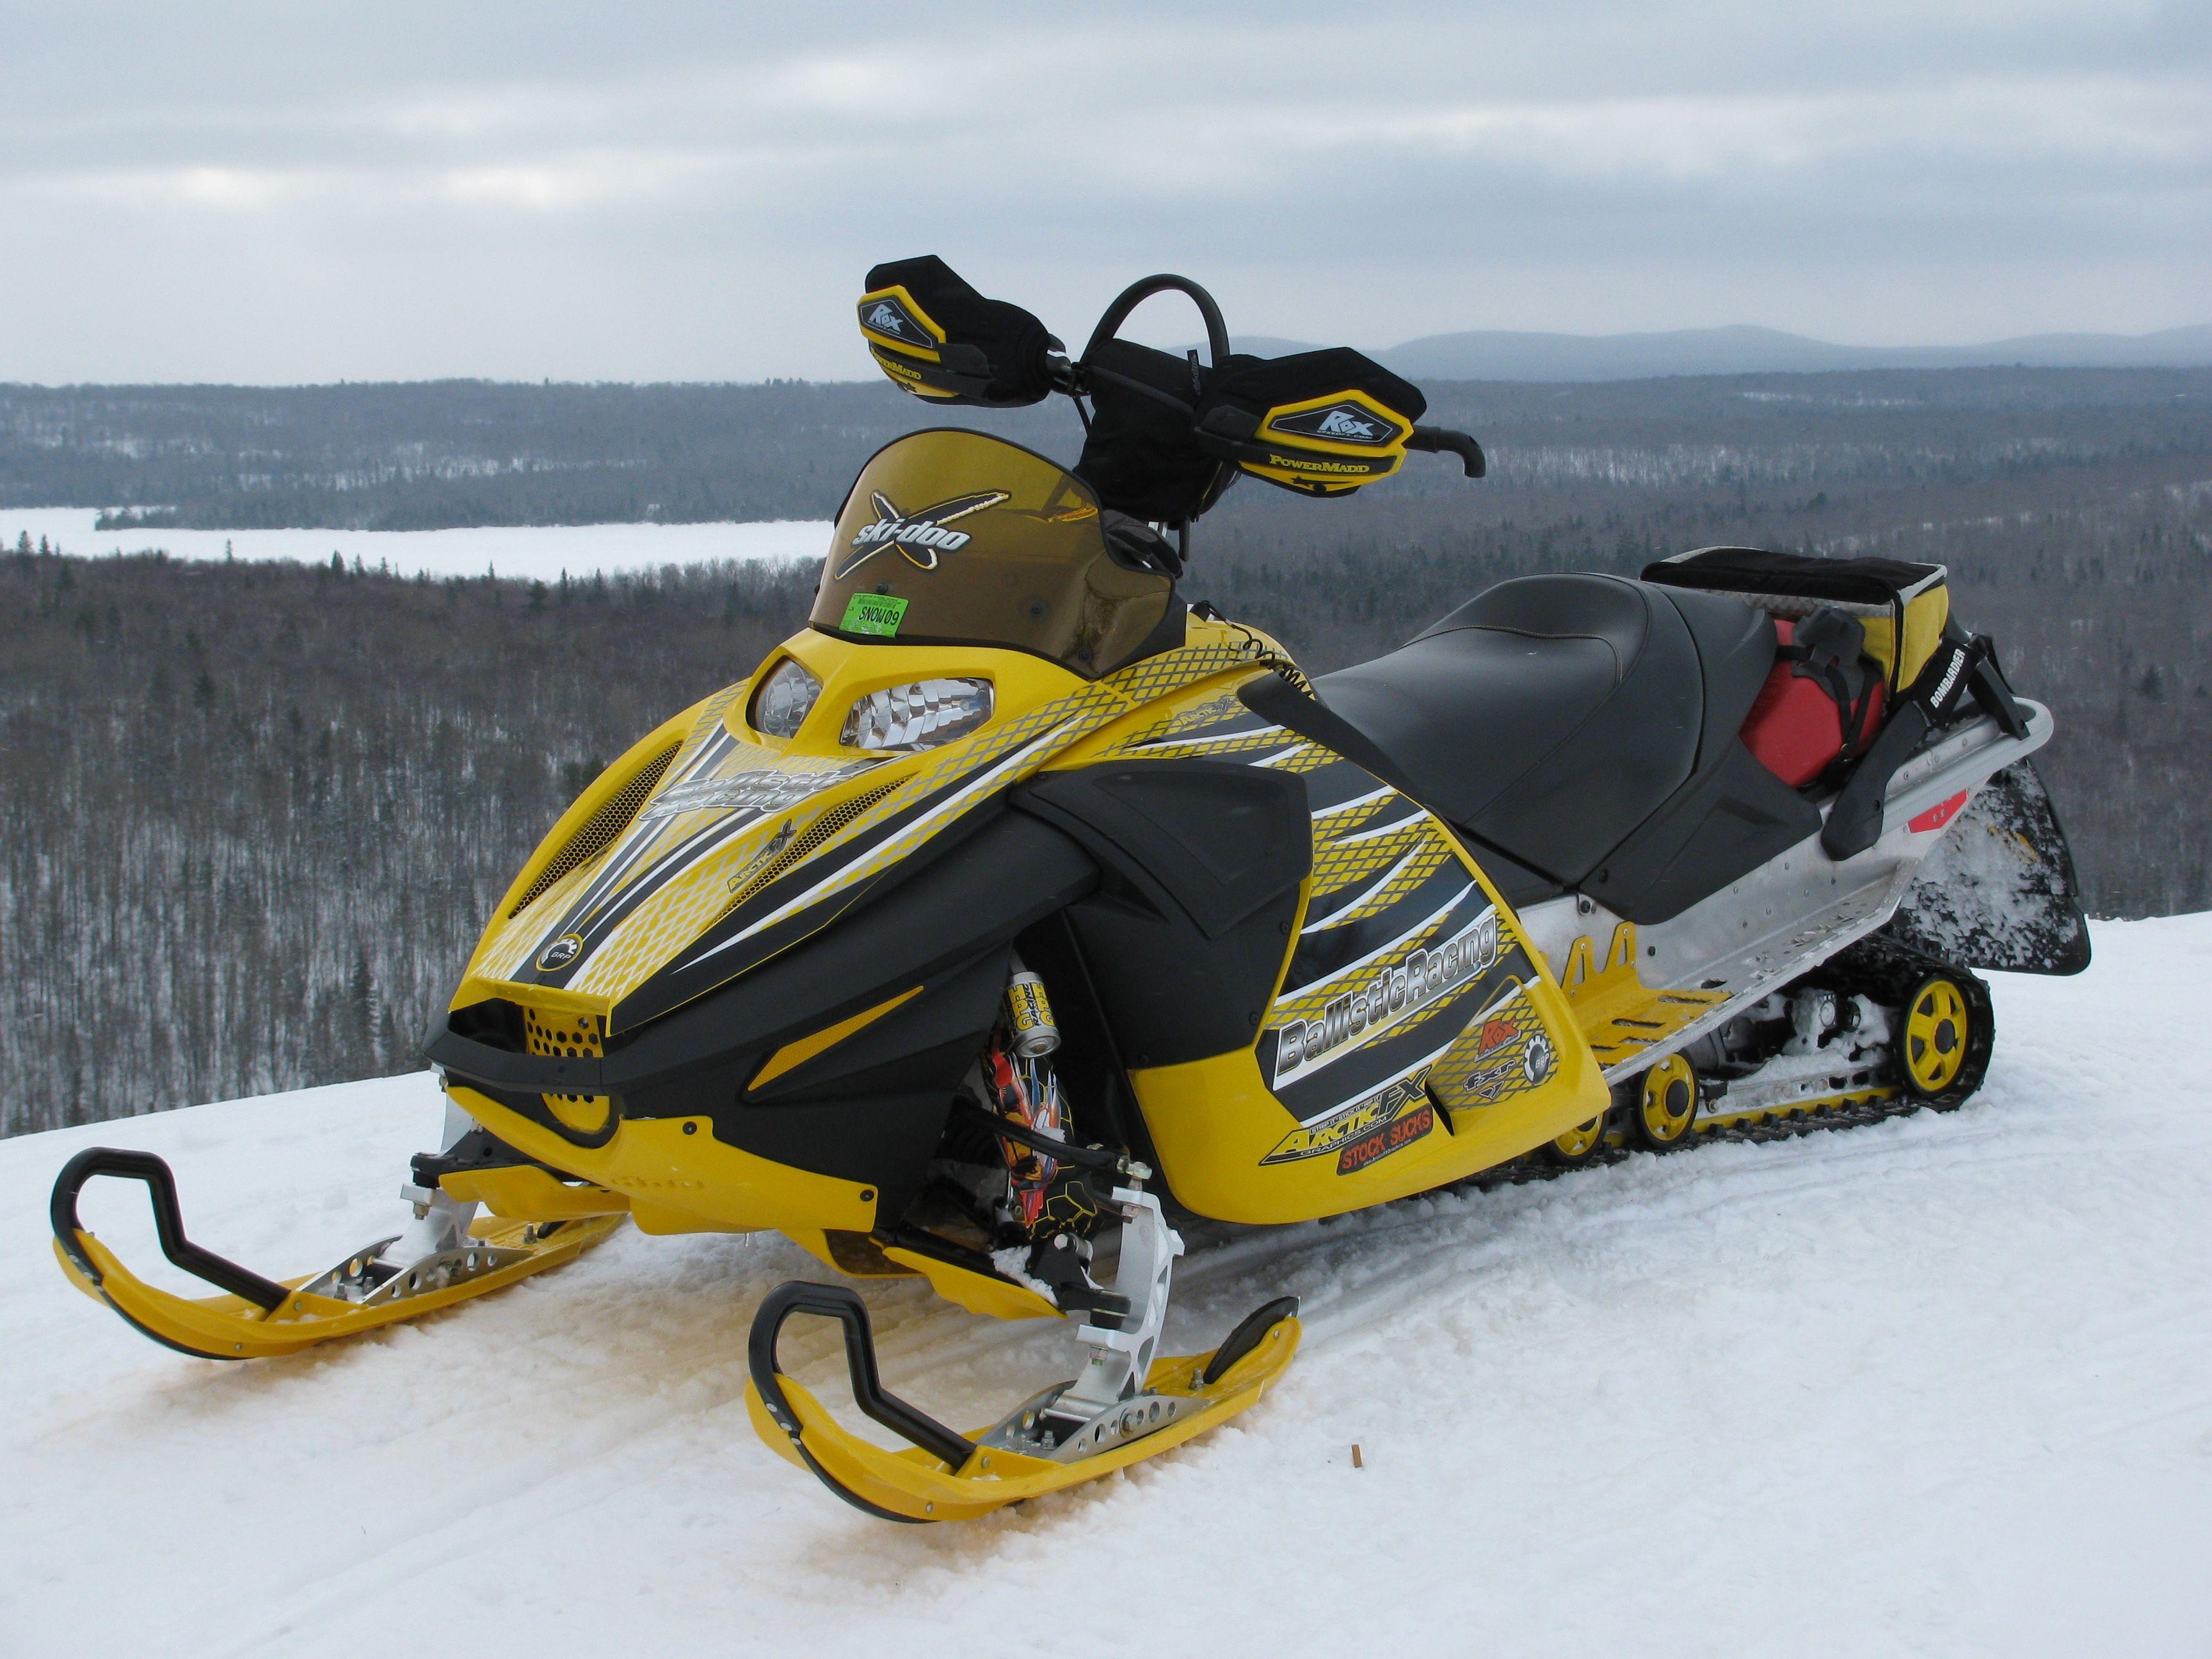 Ski Doo Snowmobile Snowmobile Skiing Snowmobile Parts